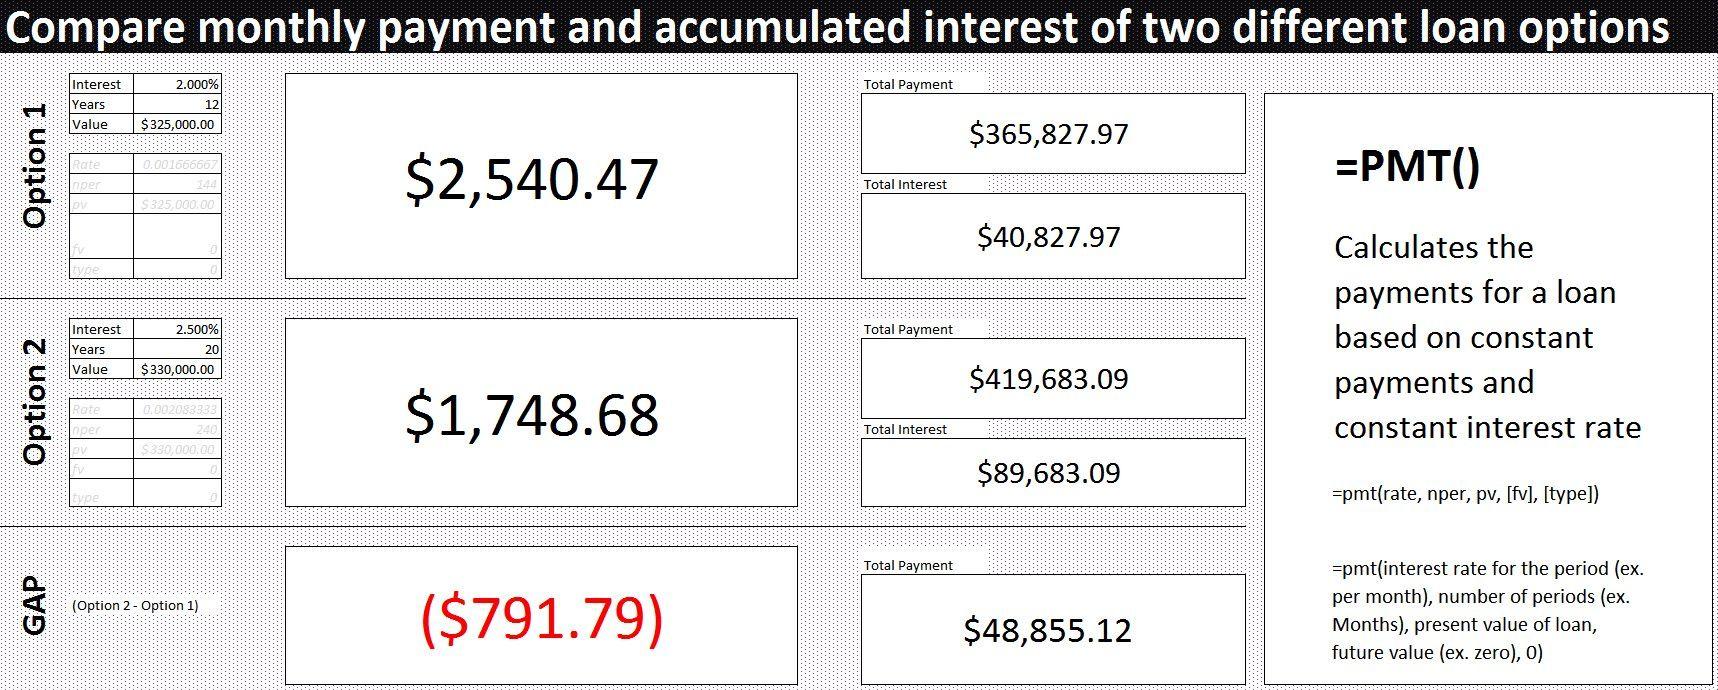 Mortgage Comparison Spreadsheet Excel Mortgage Comparison Spreadsheet Template Budget Spreadsheet